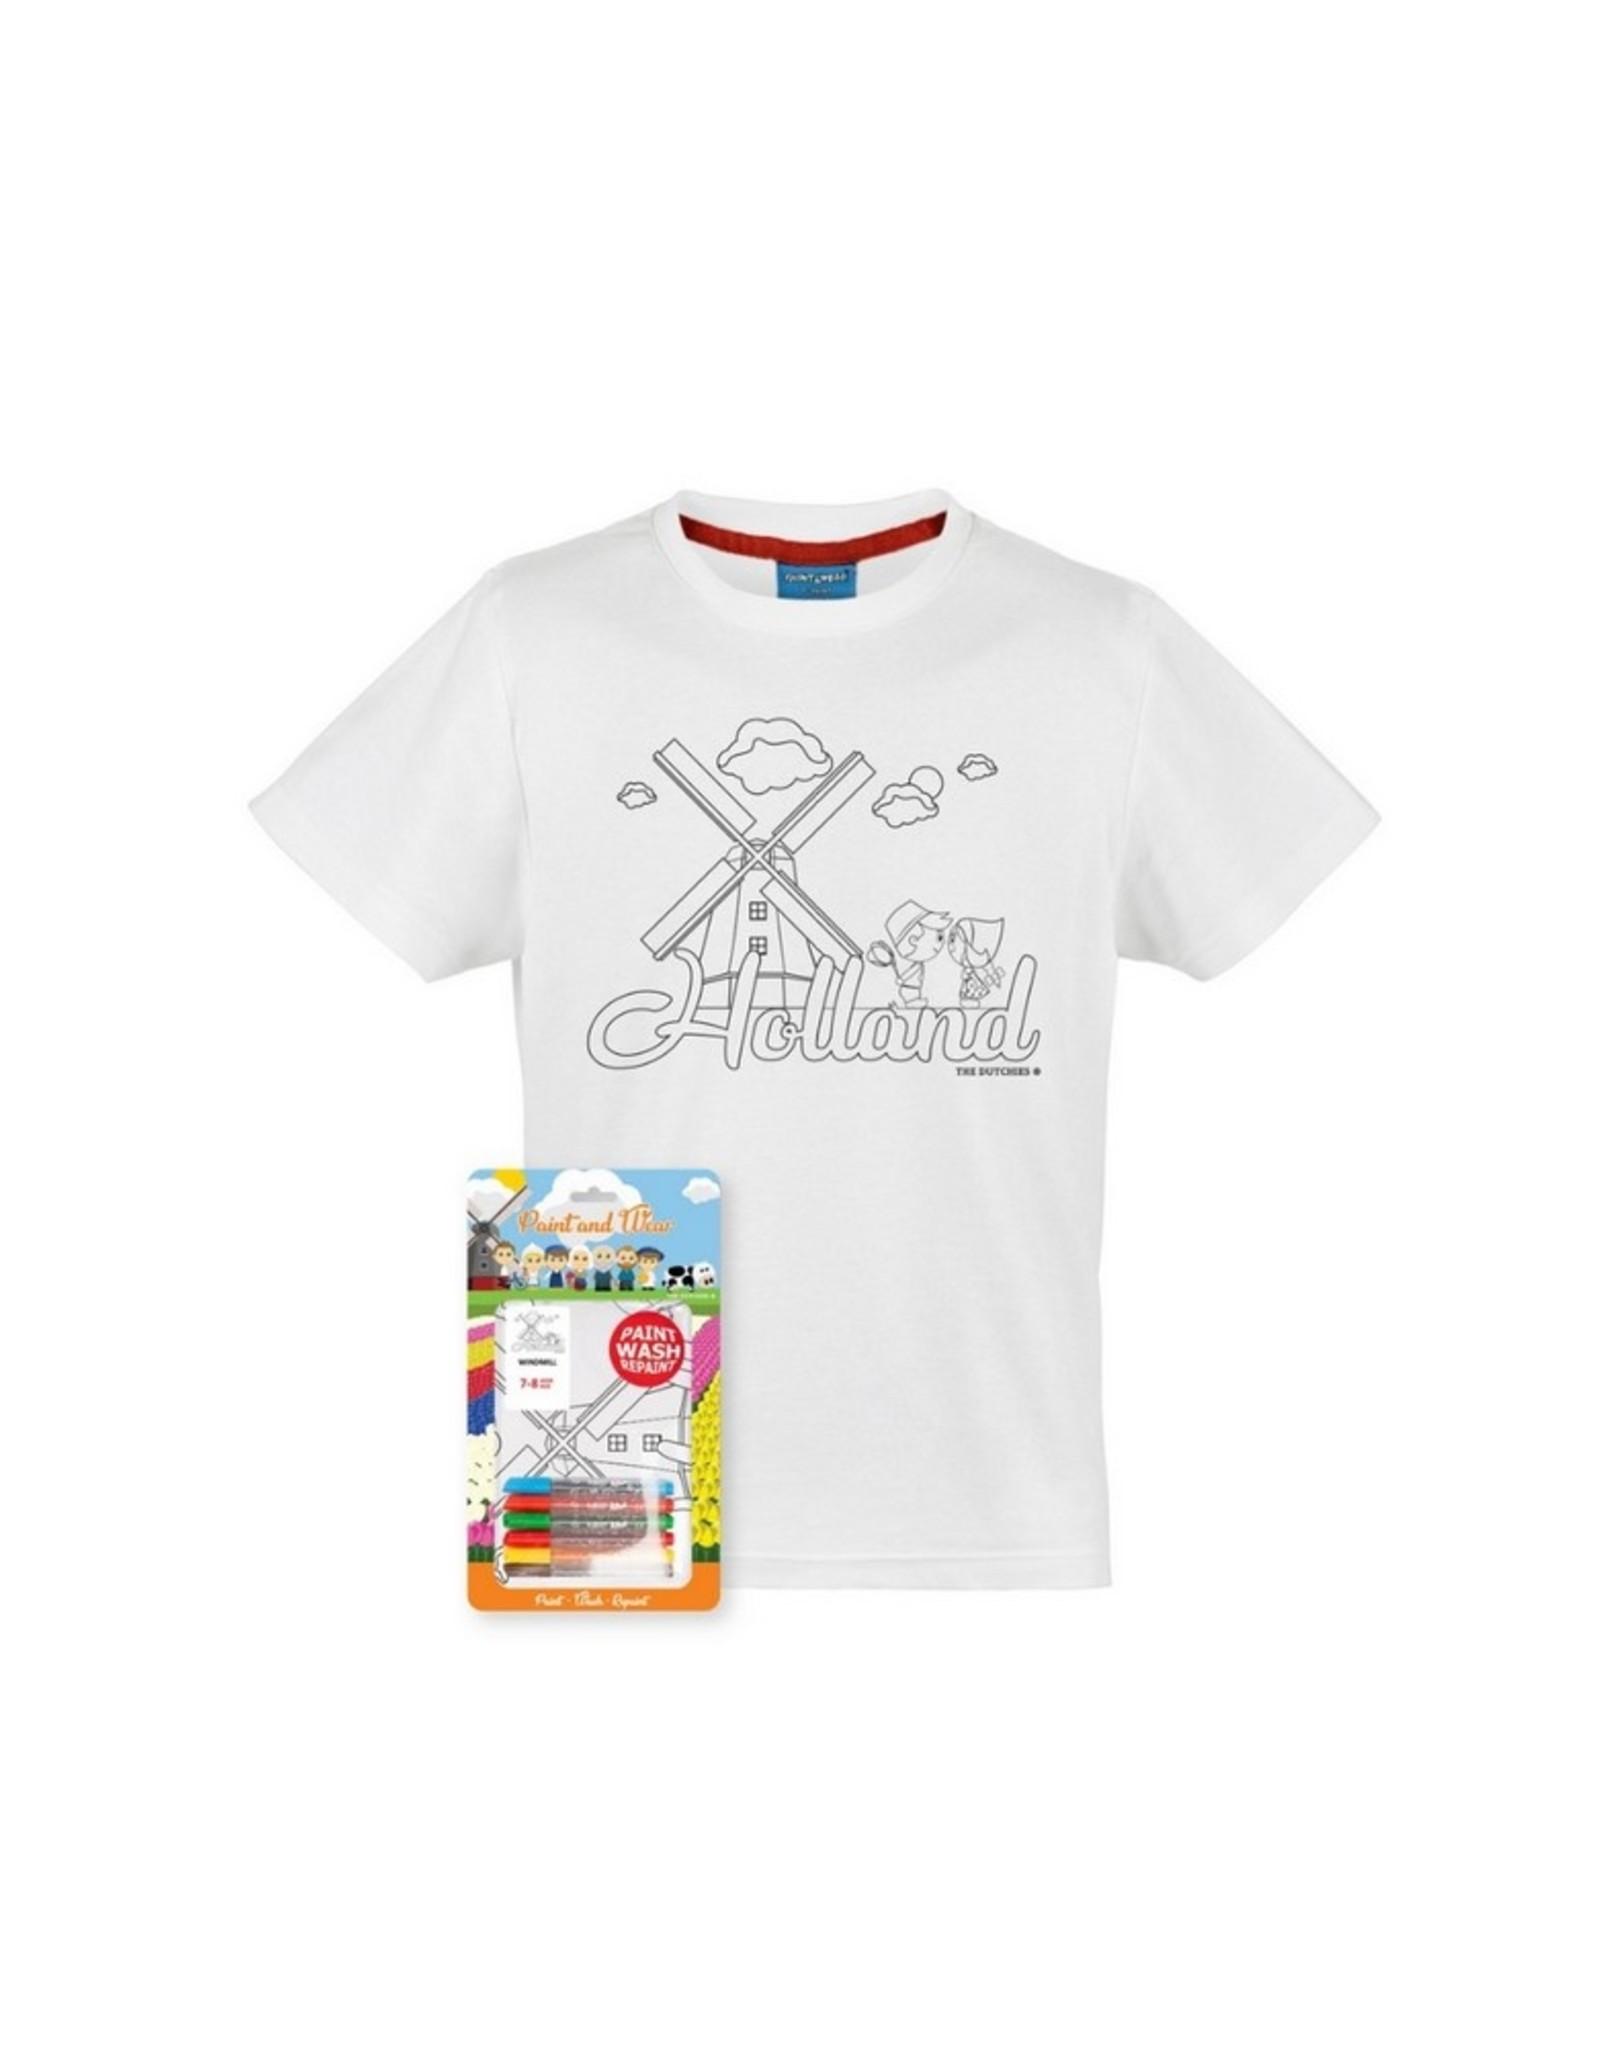 The Dutchies T-shirt Paint and Wear Molen 4-6